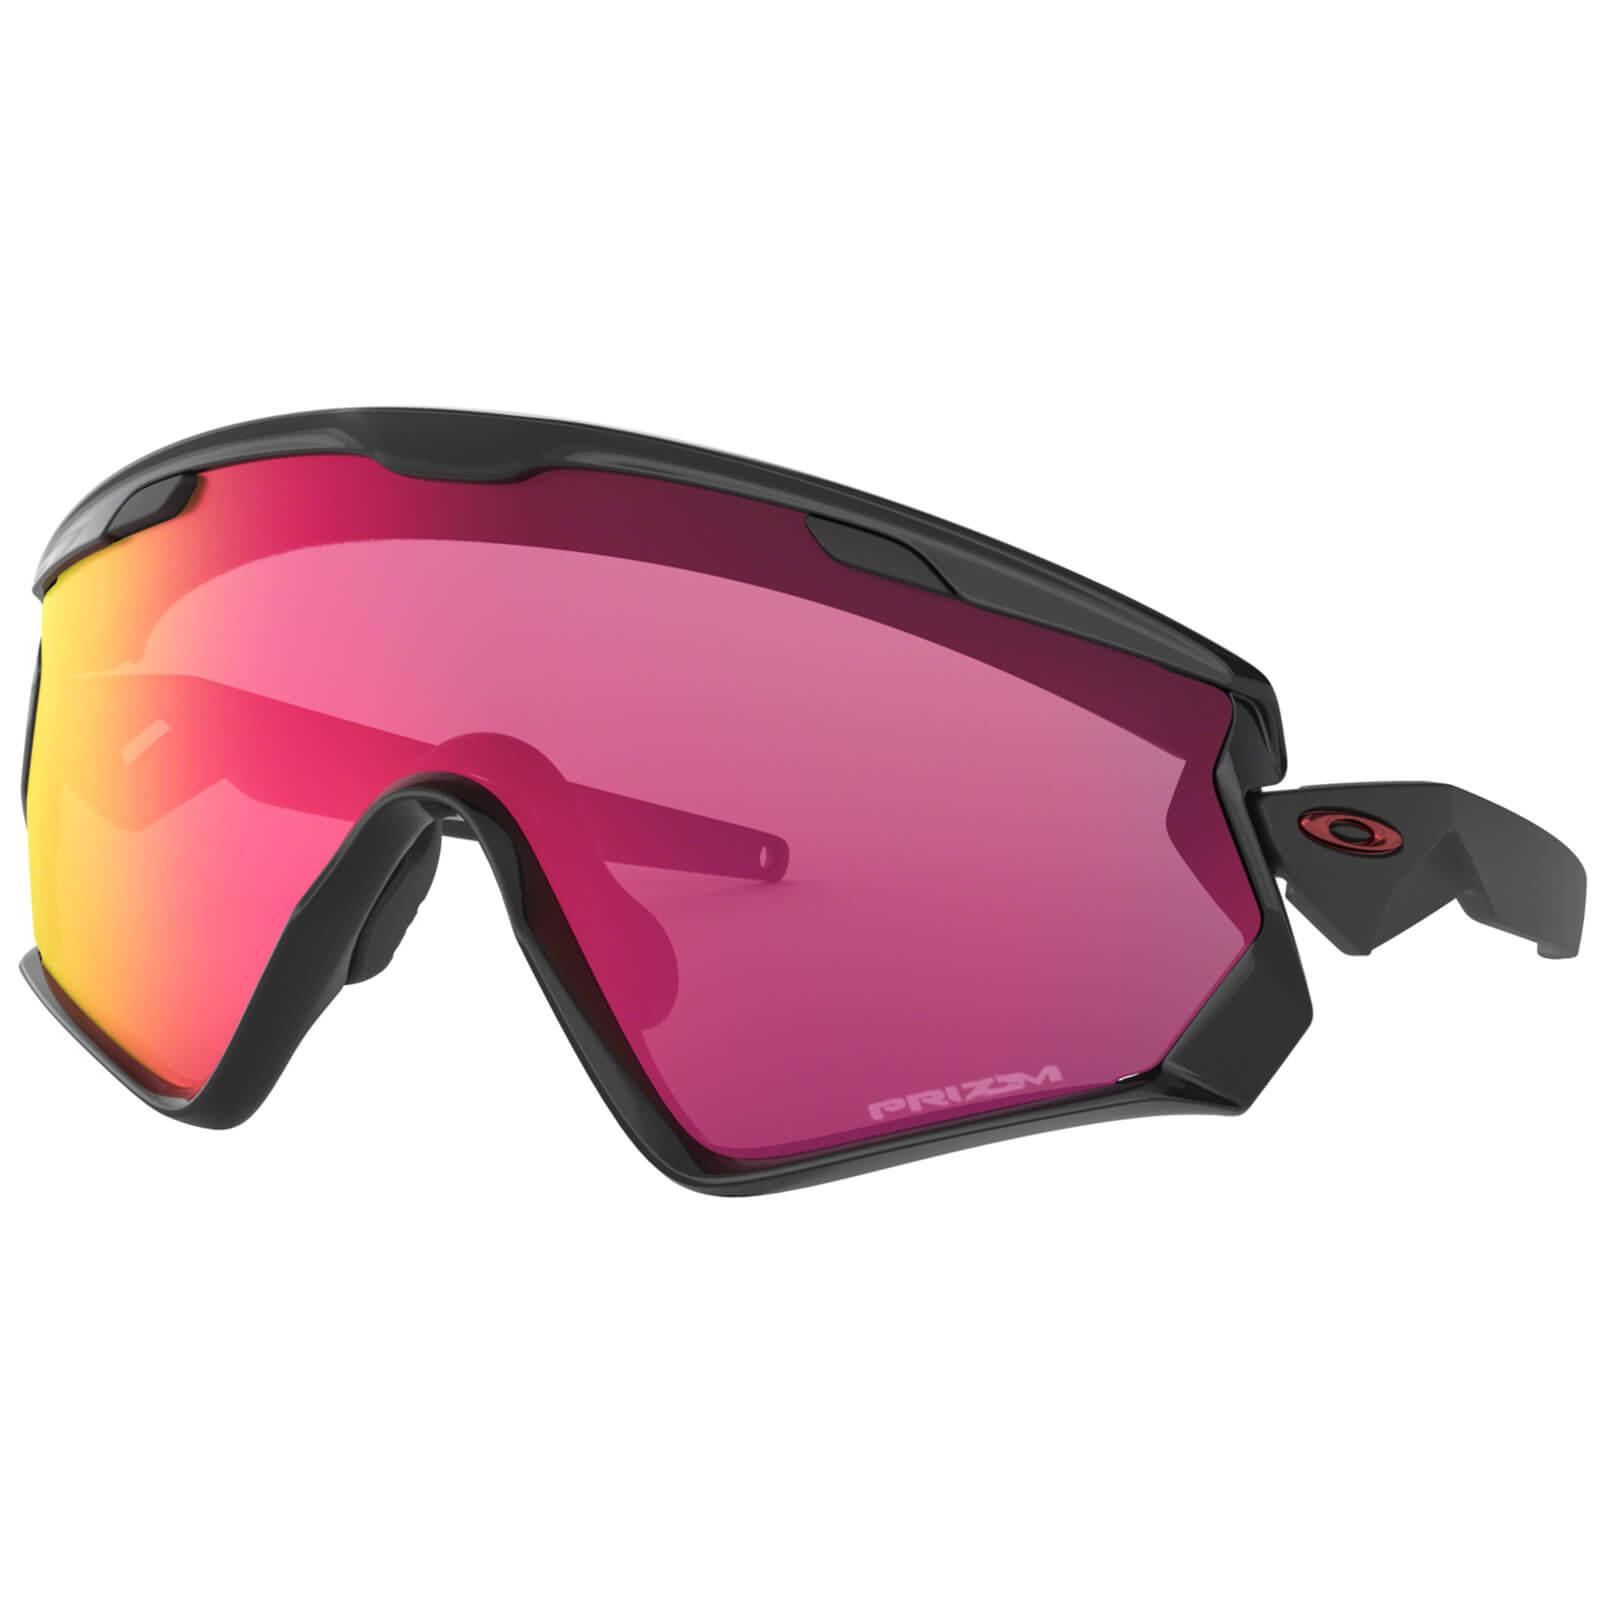 Oakley Wind Jacket 2.0 Sunglasses - Polished Black/Prizm Road